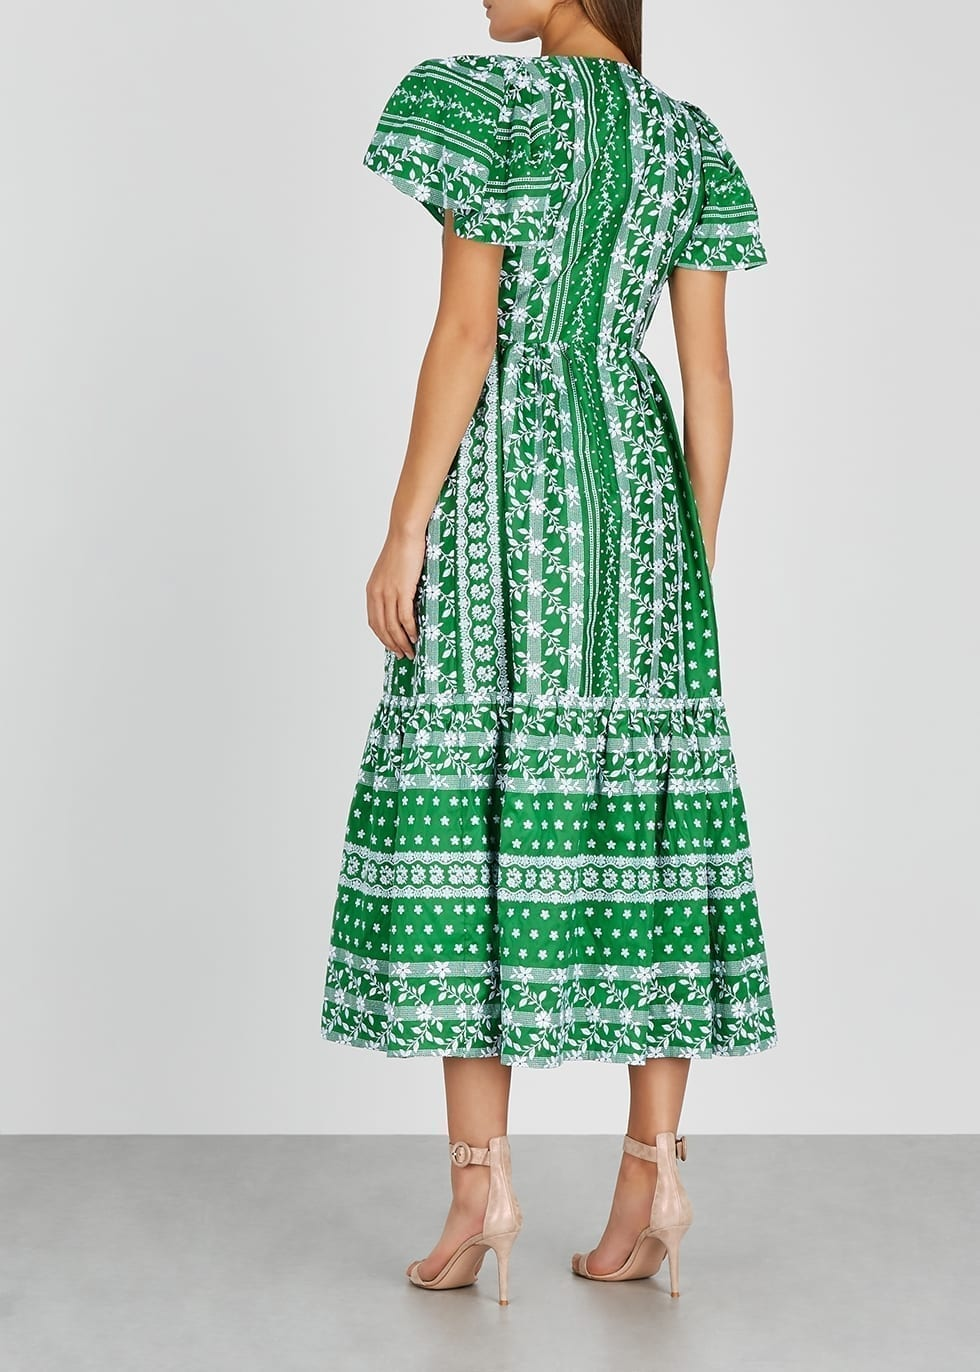 ERDEM Palomina Green Floral-embroidered Midi Dress